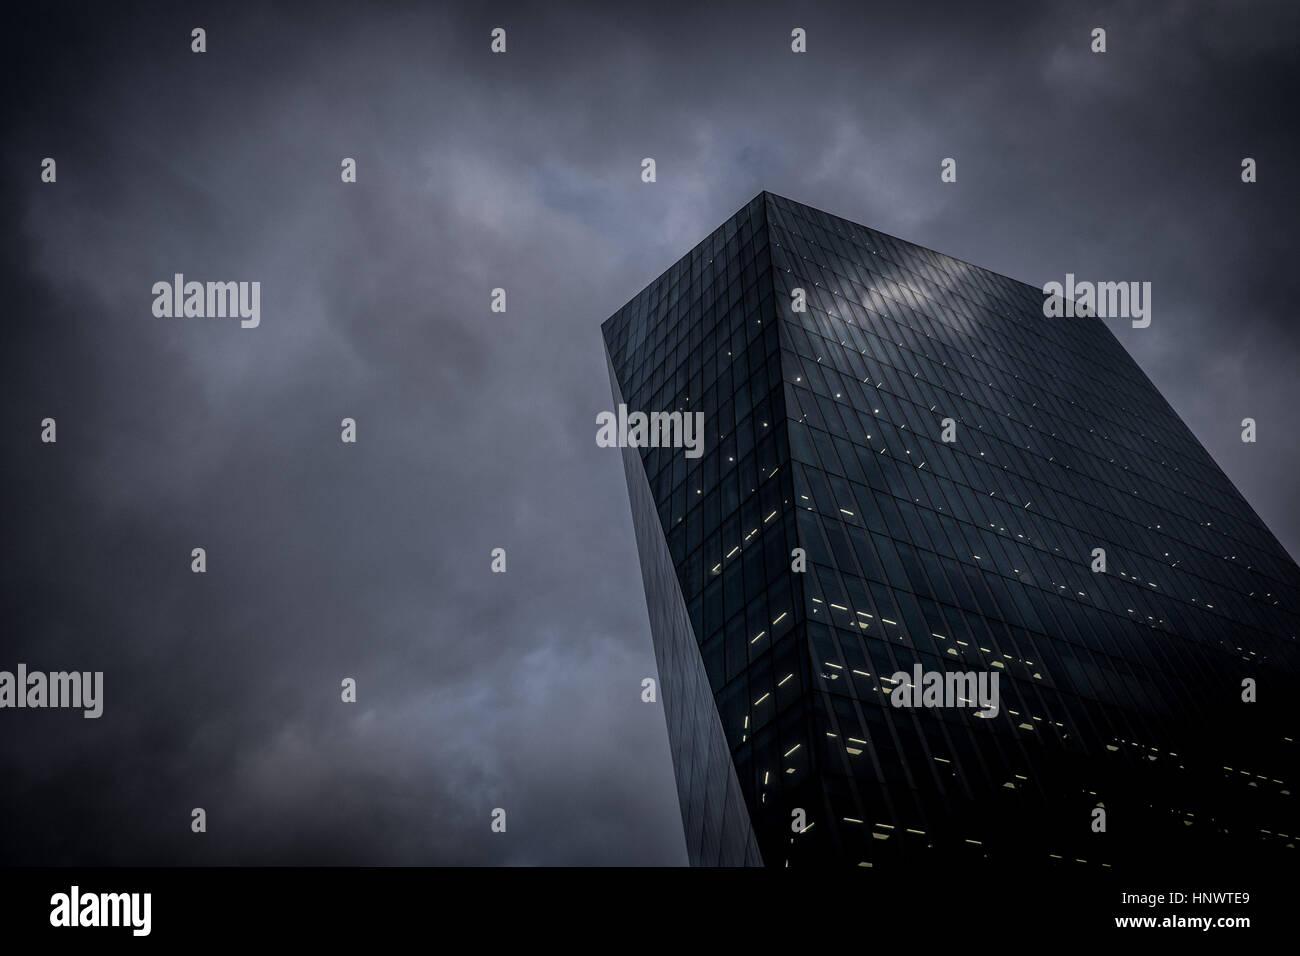 London building - Stock Image